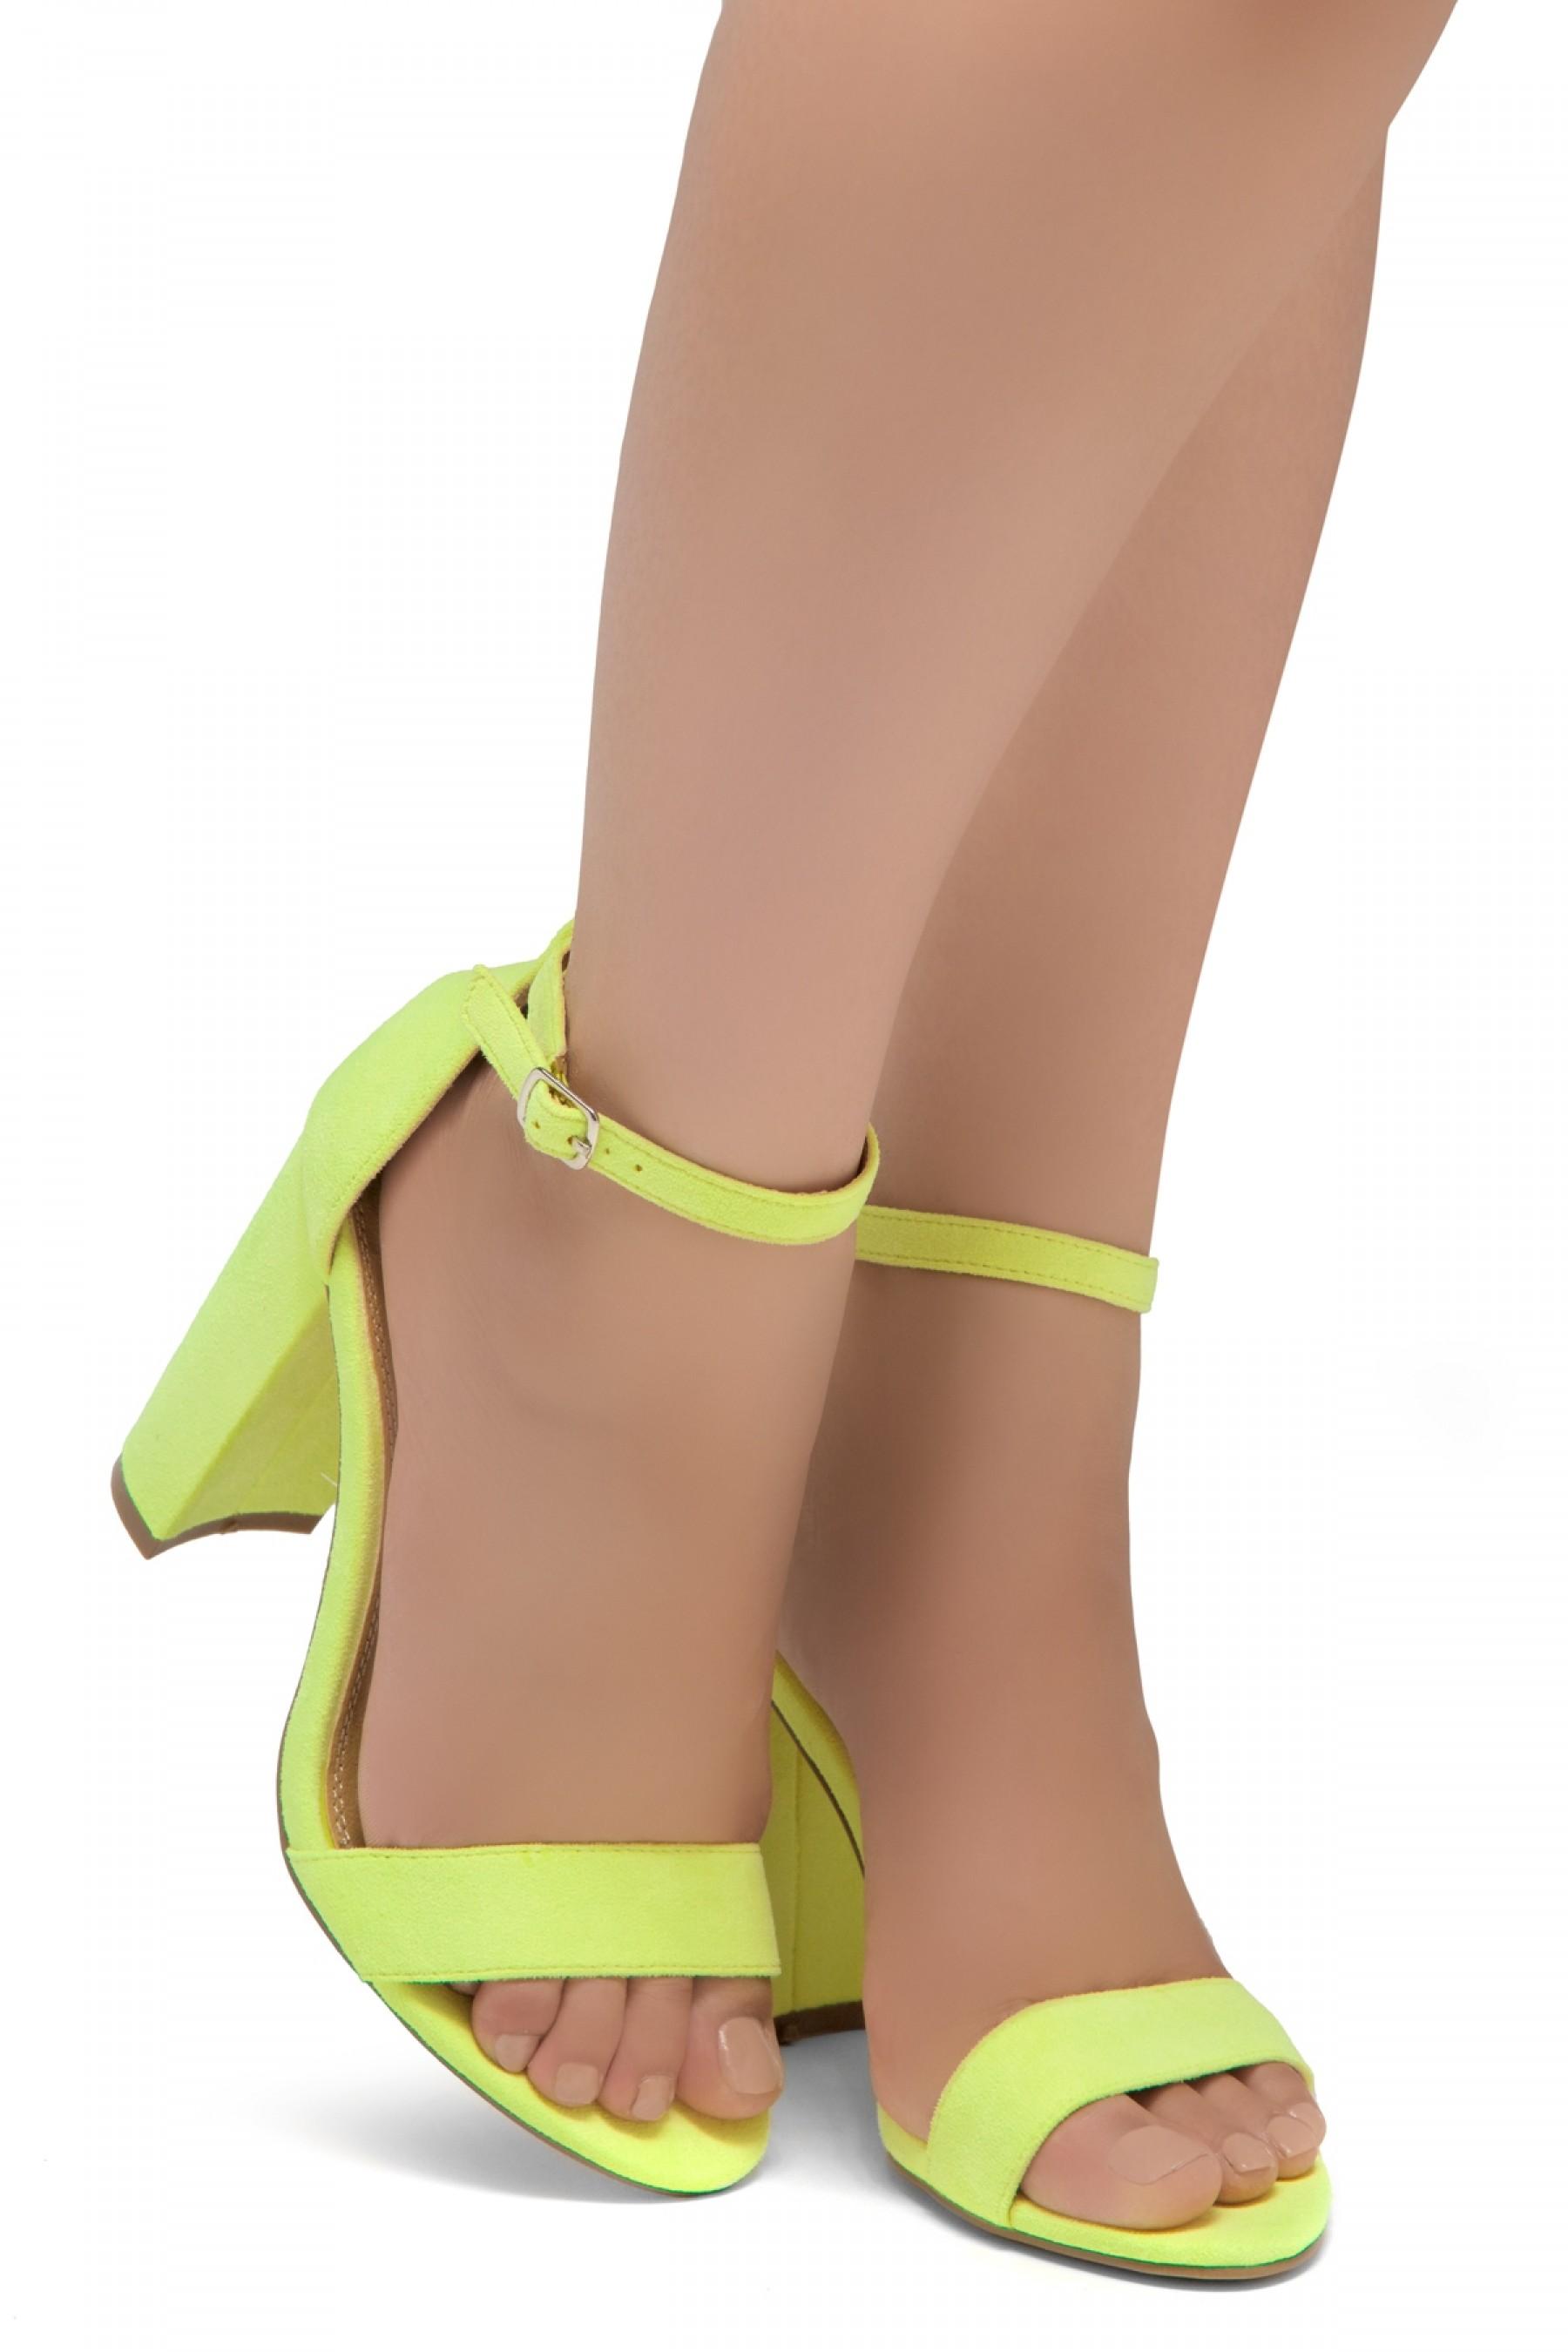 Shoe Land SL-Rosemmina Open Toe Ankle Strap Chunky Heel (YellowNeon)